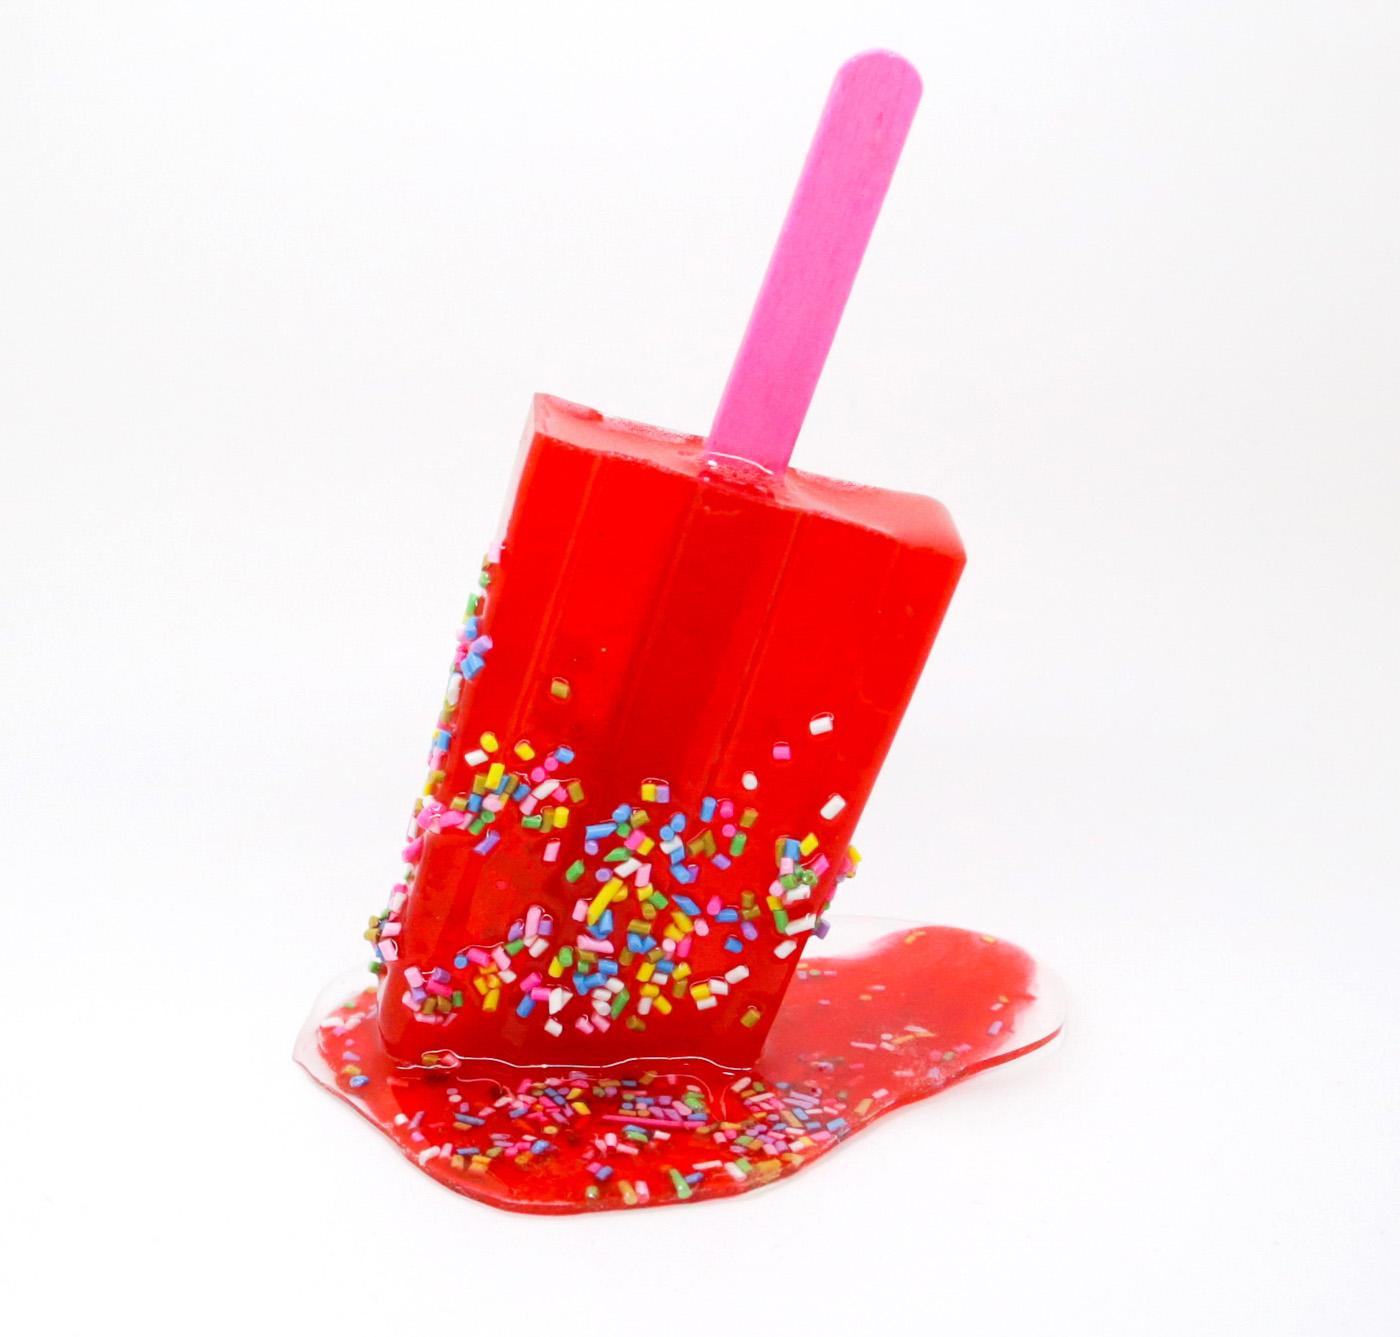 Red Sprinkle Popsicle © Betsy Enzensberger